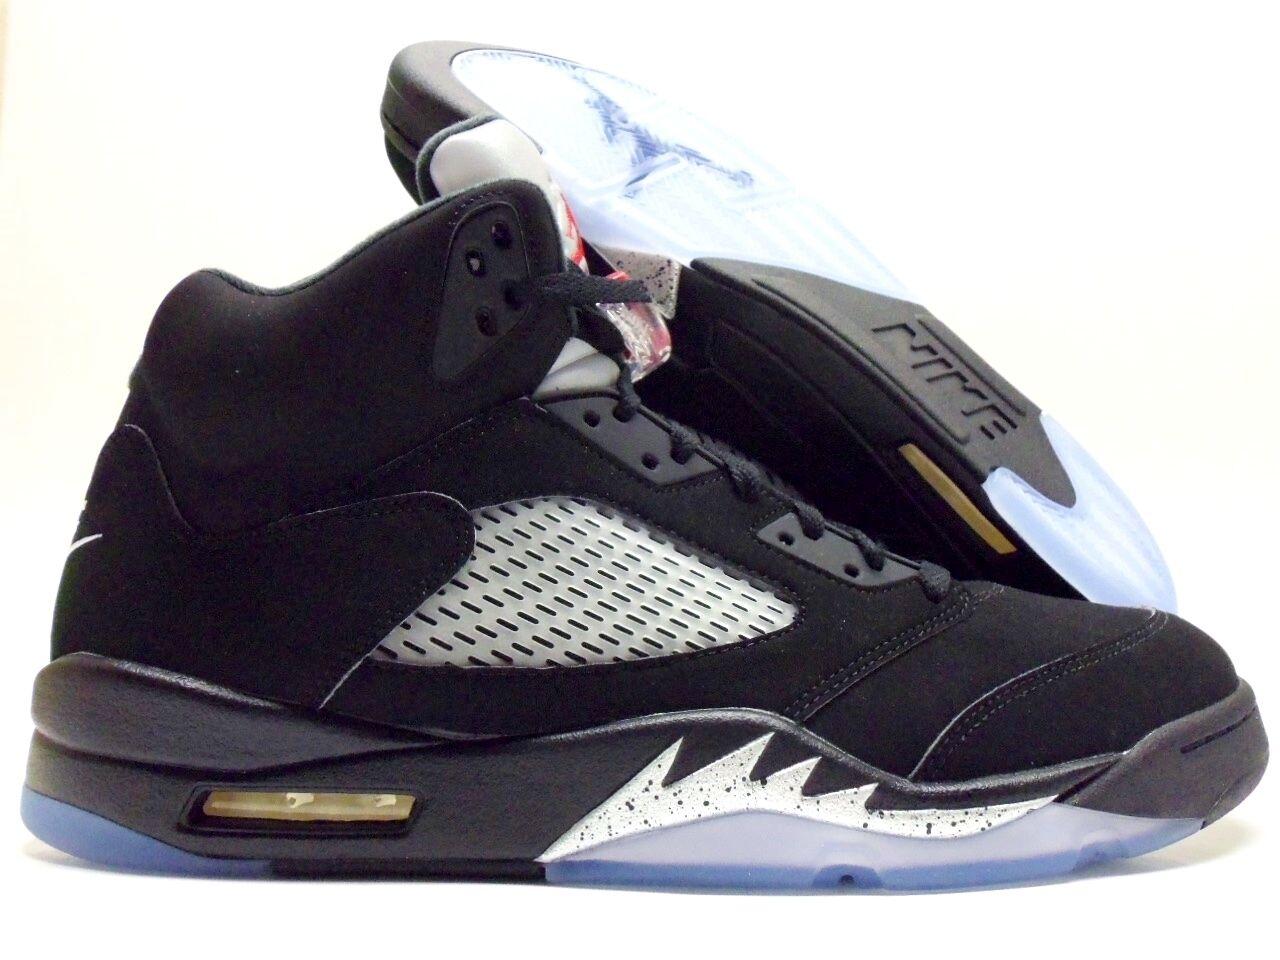 Nike Air Jordan 5 retro Og Negro / / Negro Fire red-met Plata Talla Hombre 15 de reducción de precios baratos y de moda hermosa e0ce34